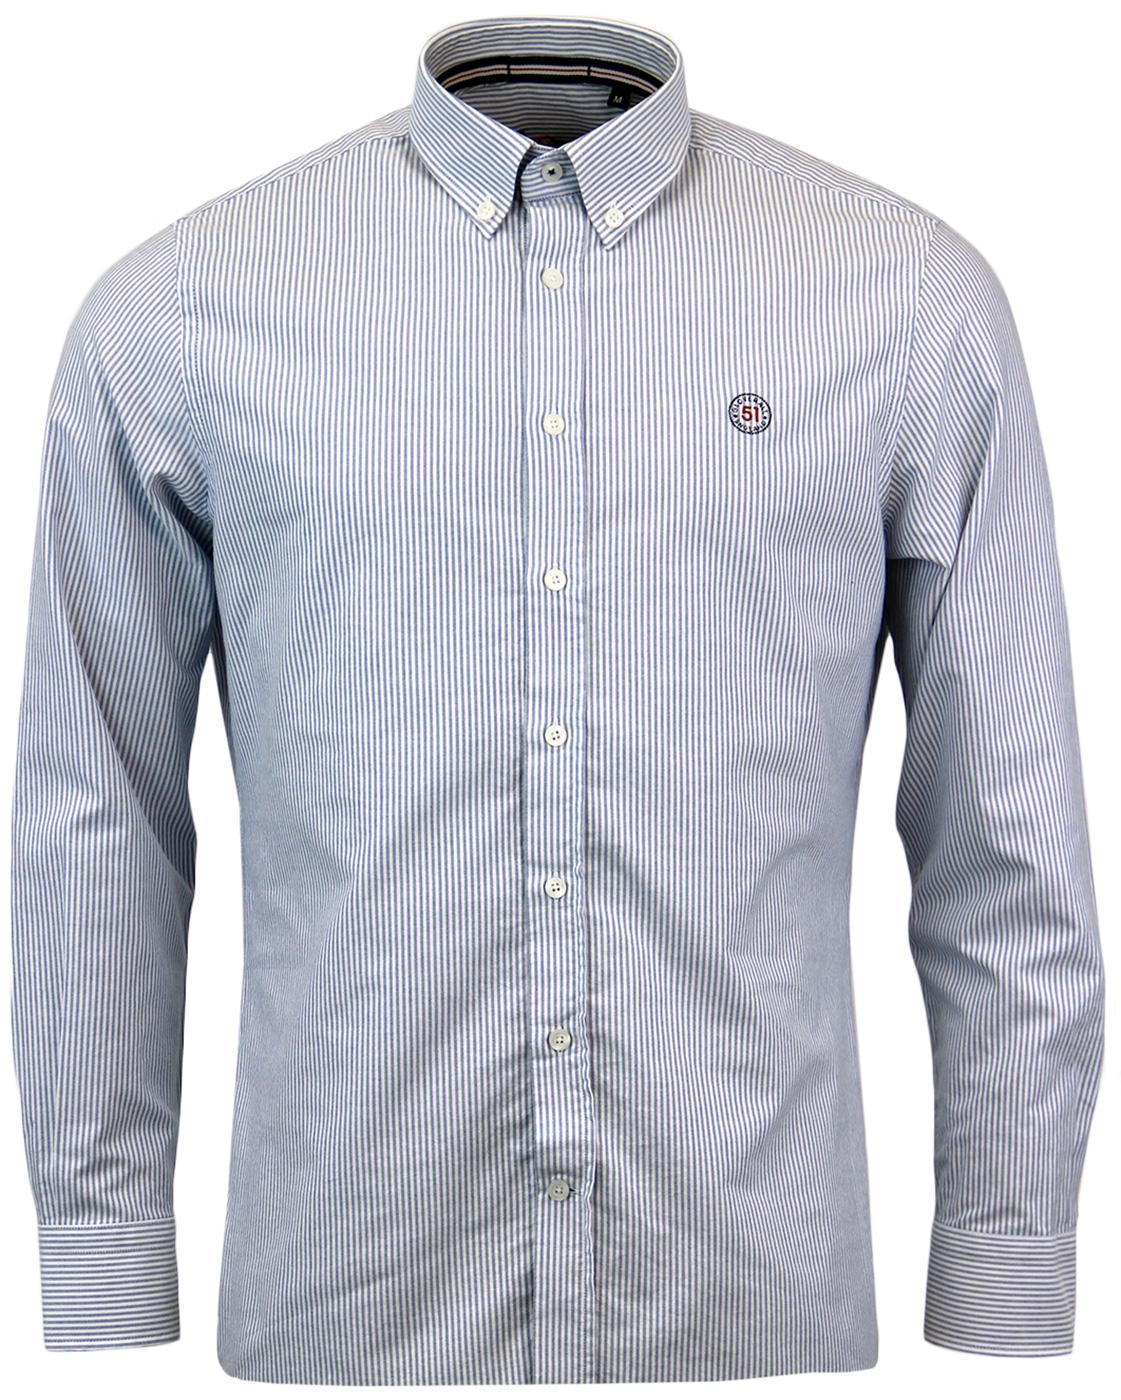 GLOVERALL Retro Sixties Mod Stripe Oxford Shirt